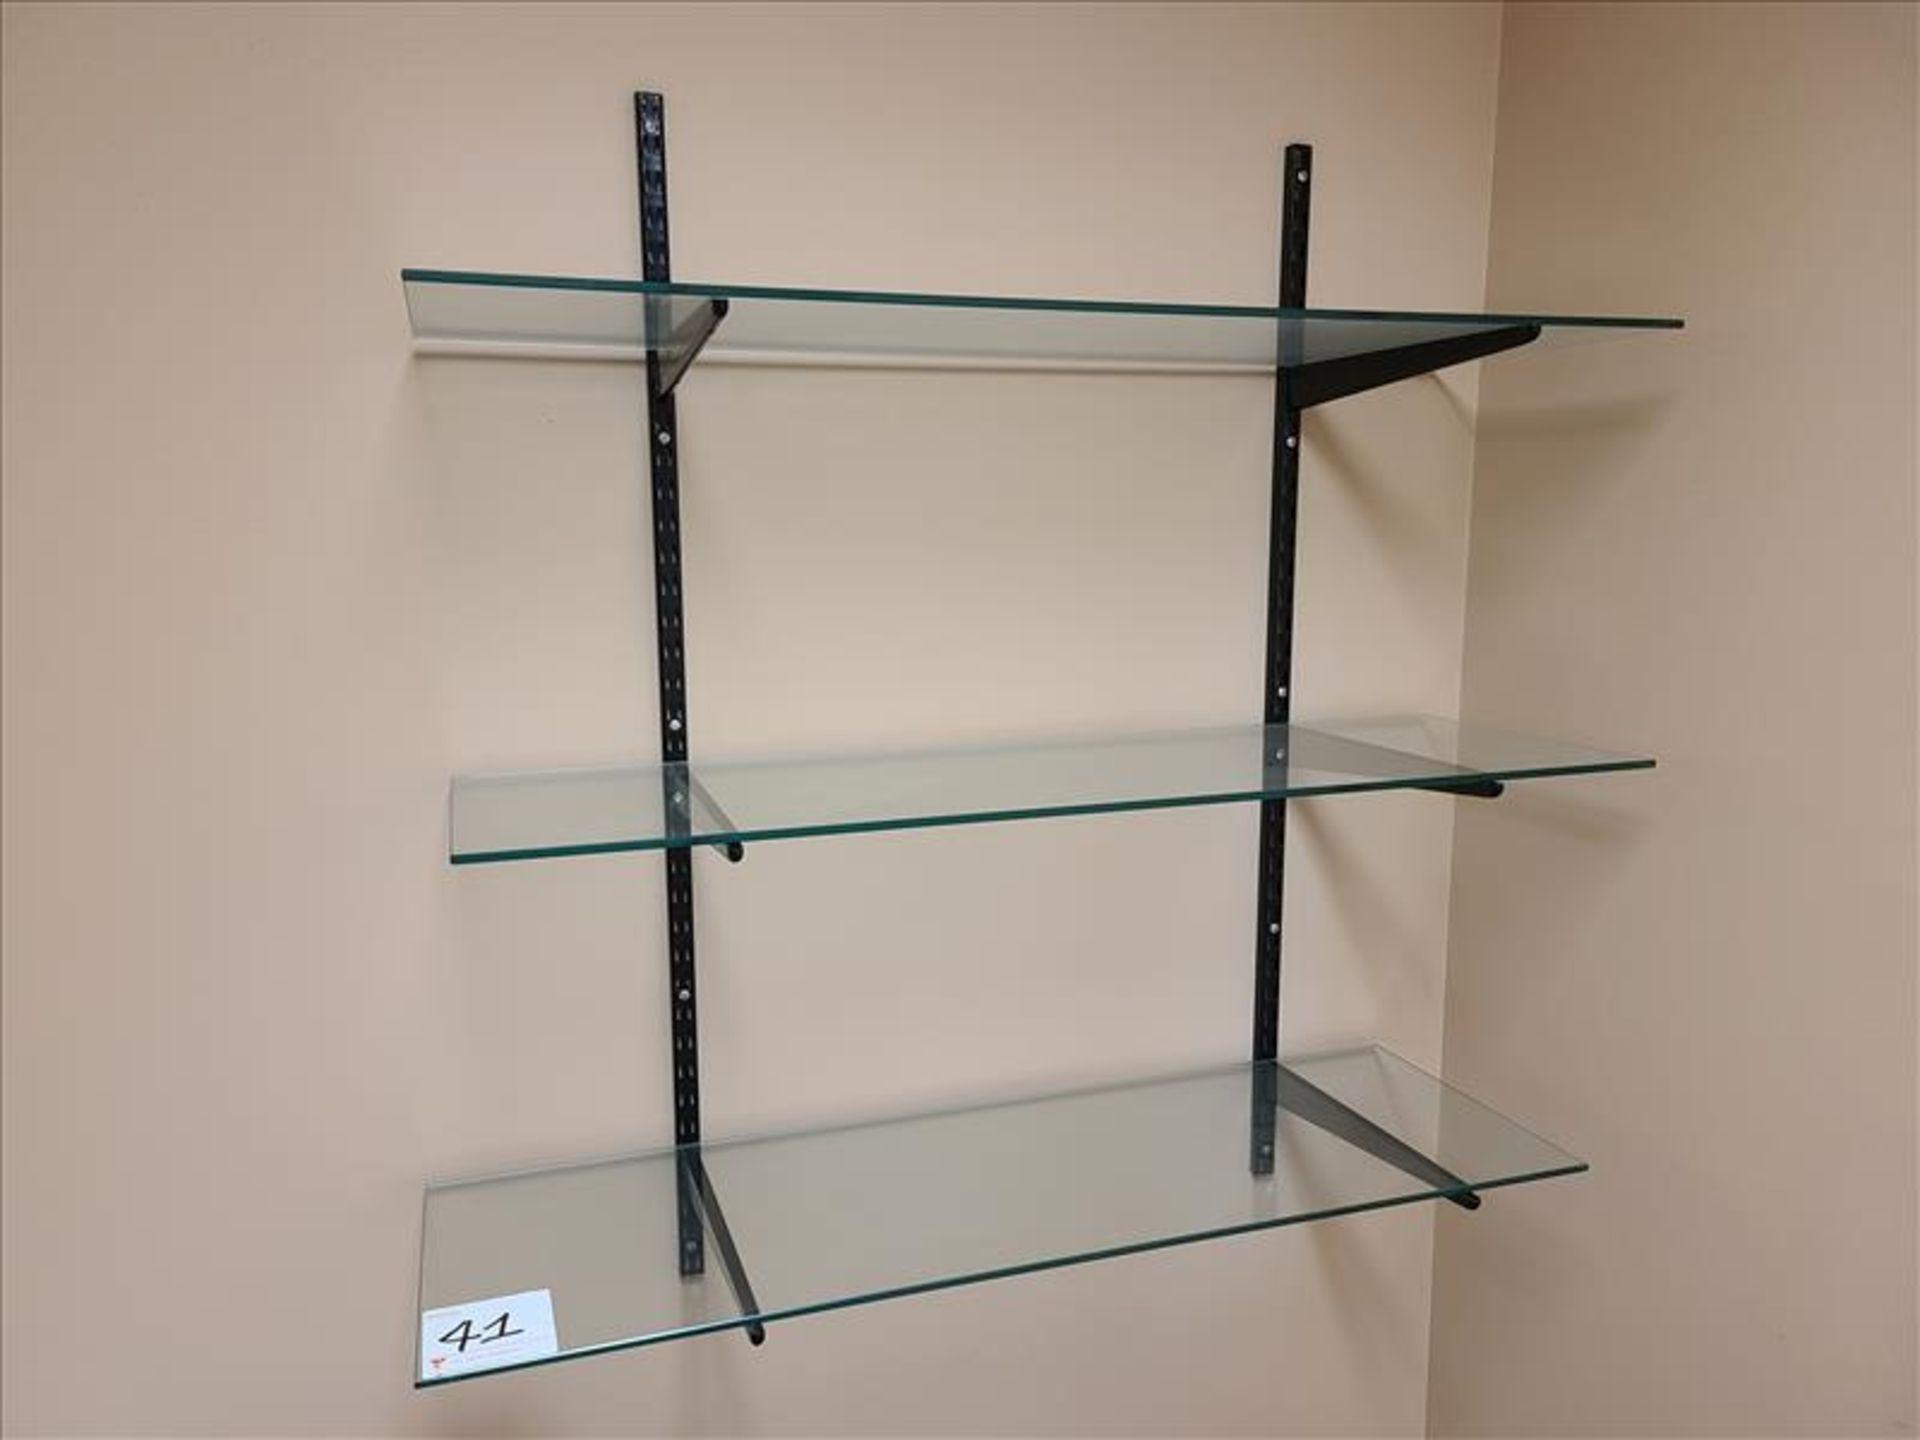 3 Tier Adjustable Tempered Glass Shelf